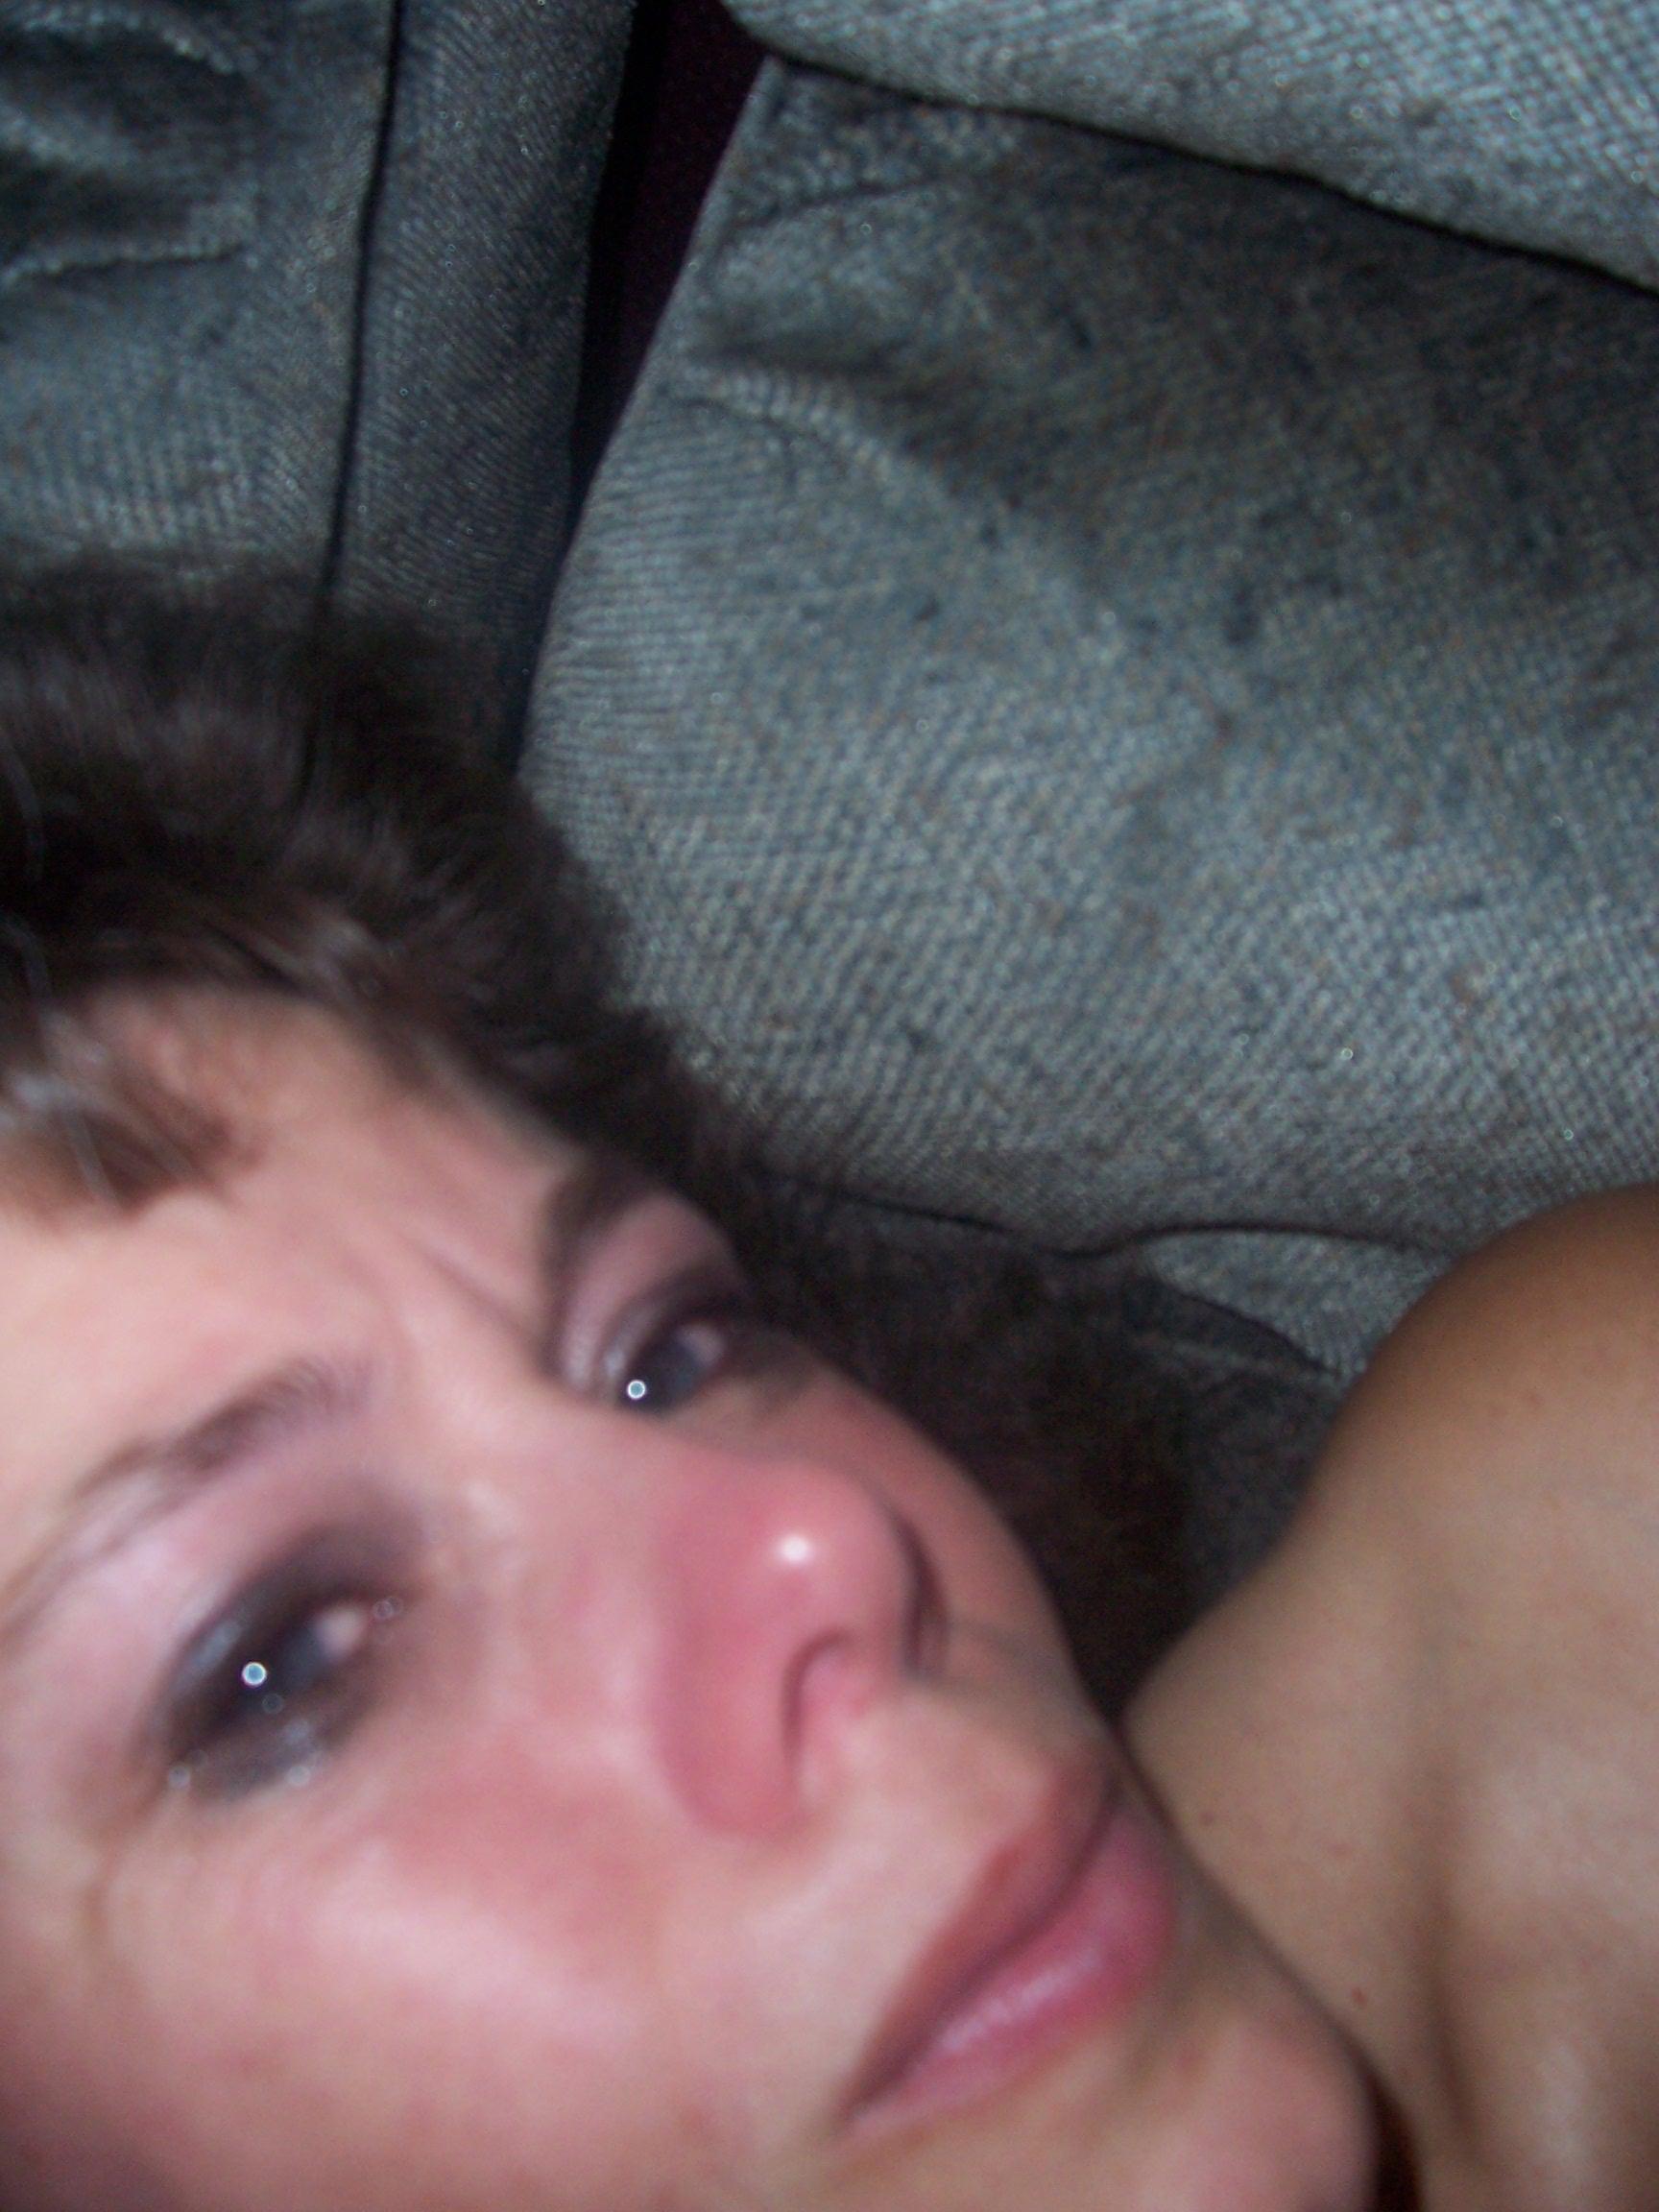 sloppy drunk - Latina On Yuvutu Homemade Amateur Porn Movies And XXX Sex  Videos